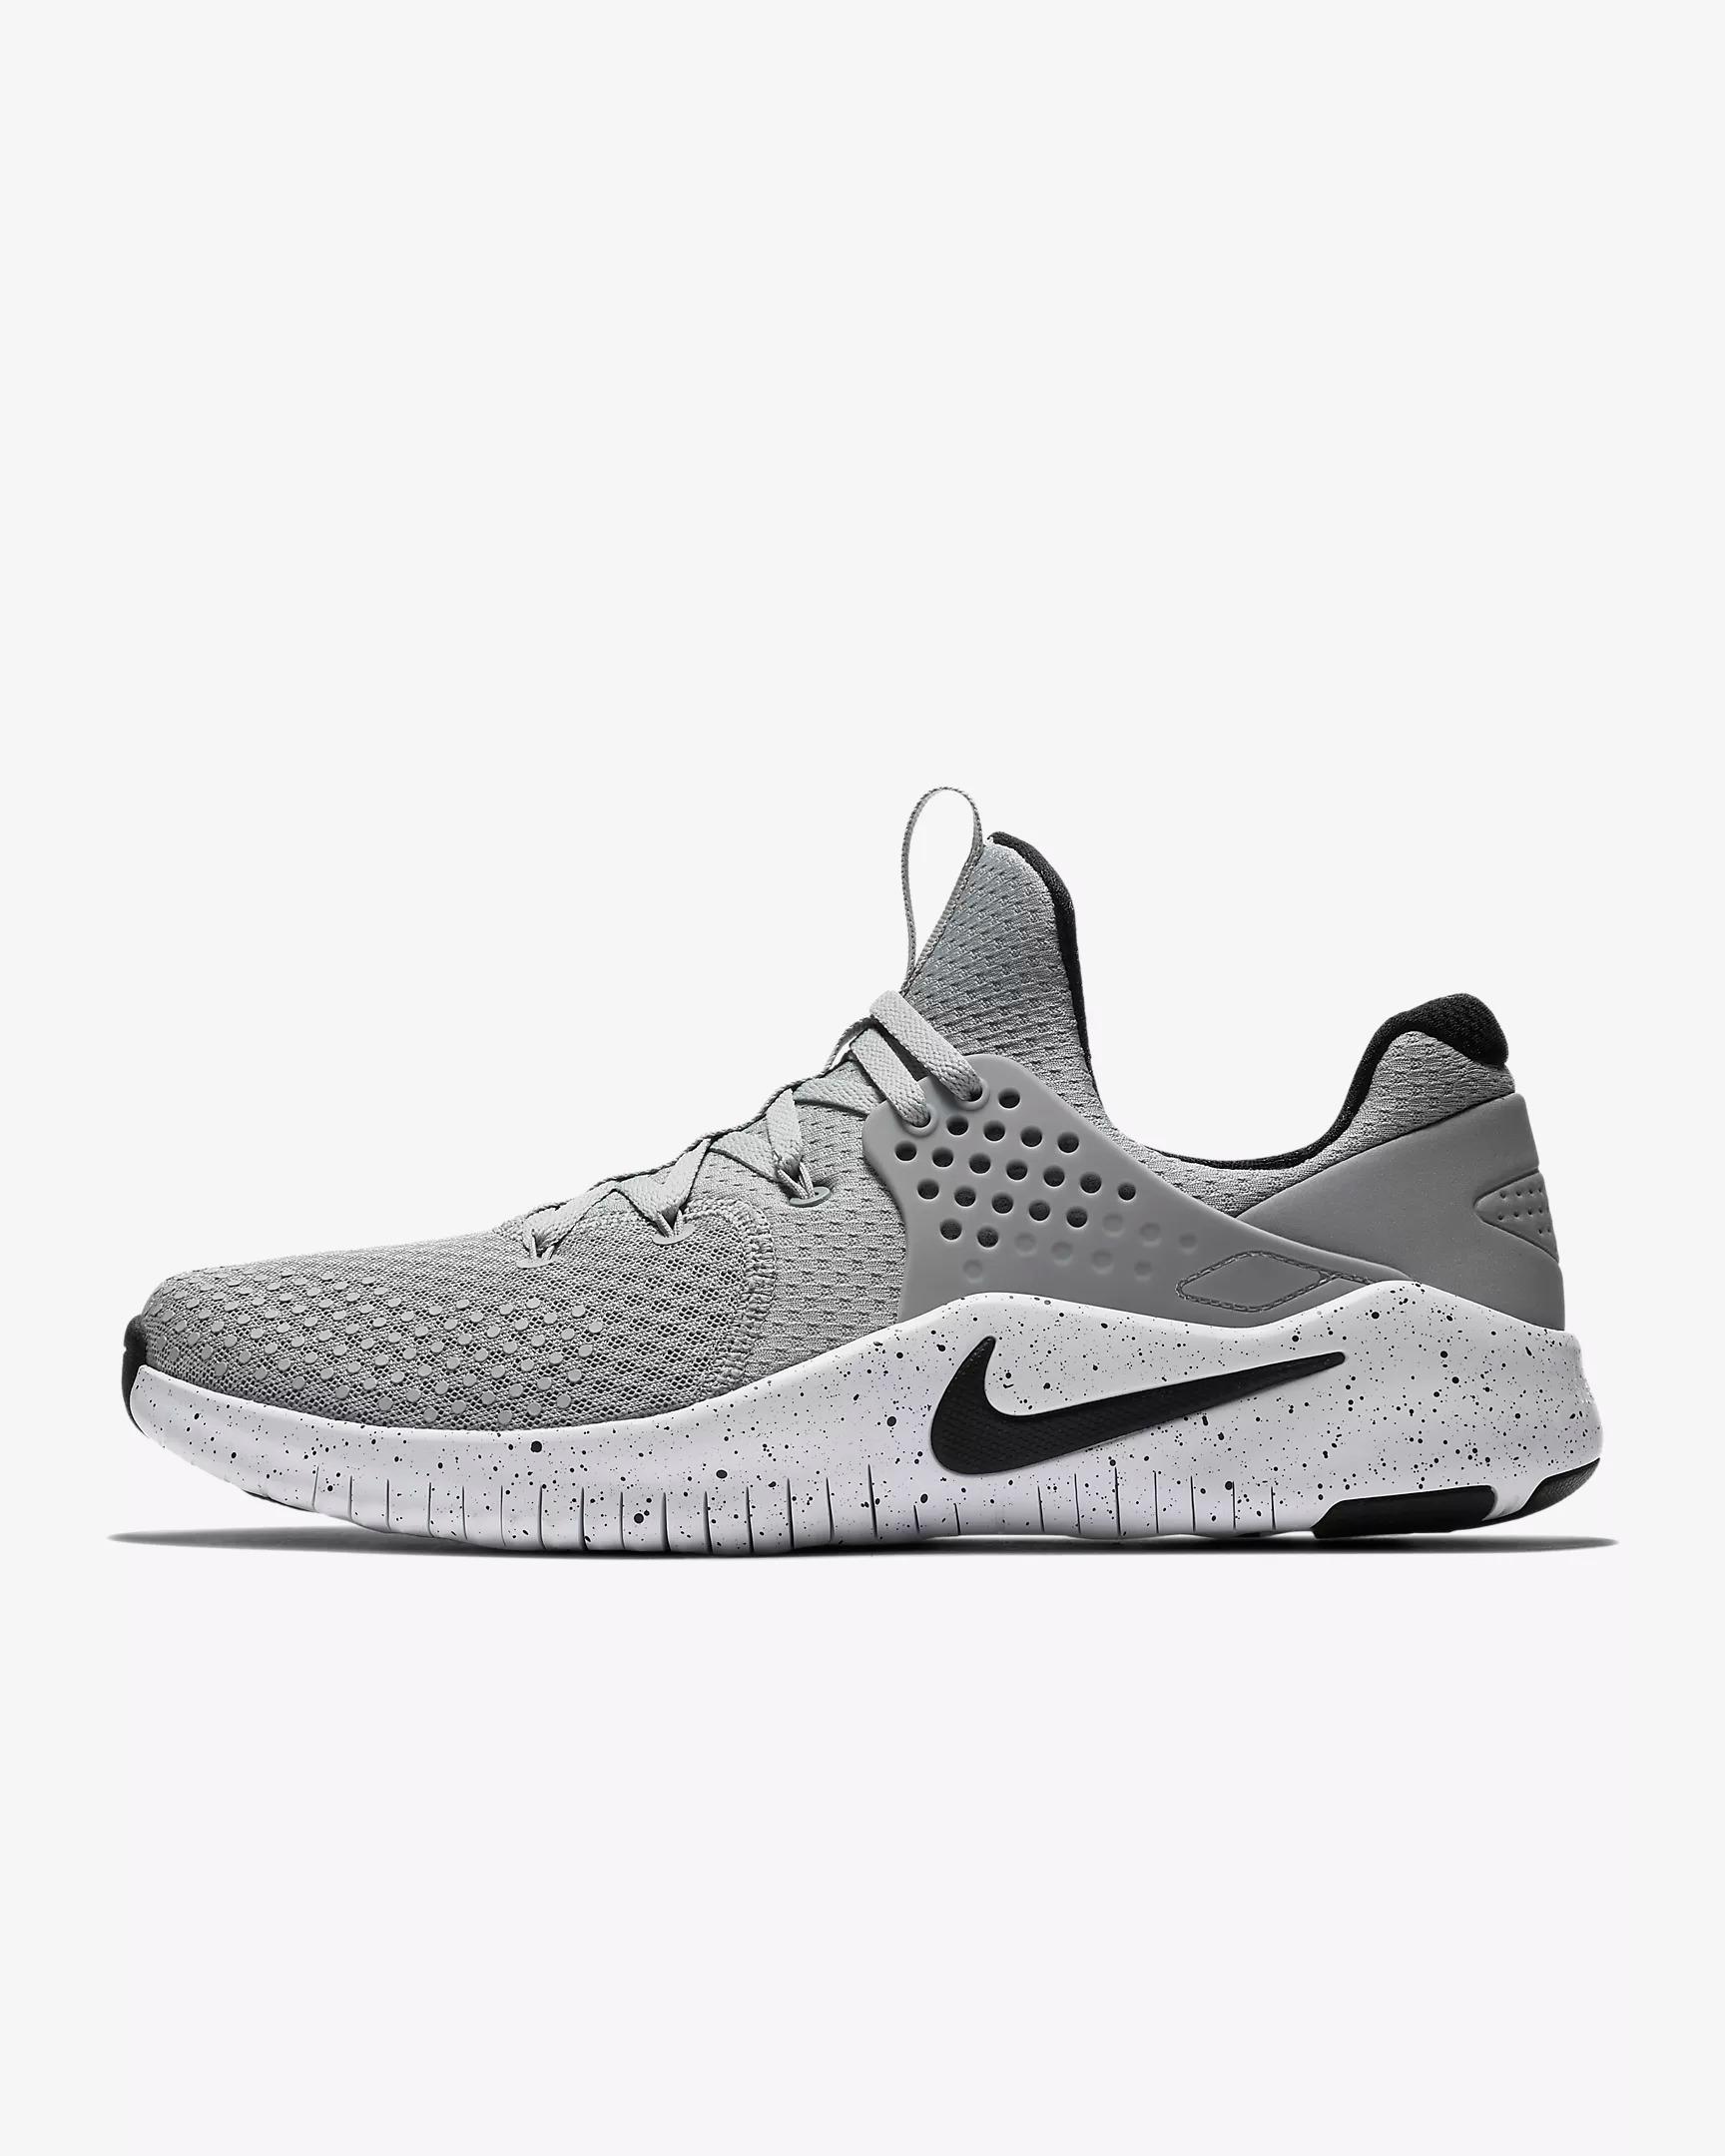 Nike Free Trainer V8 Training Shoes - SPORT SHOES TRAINING ...